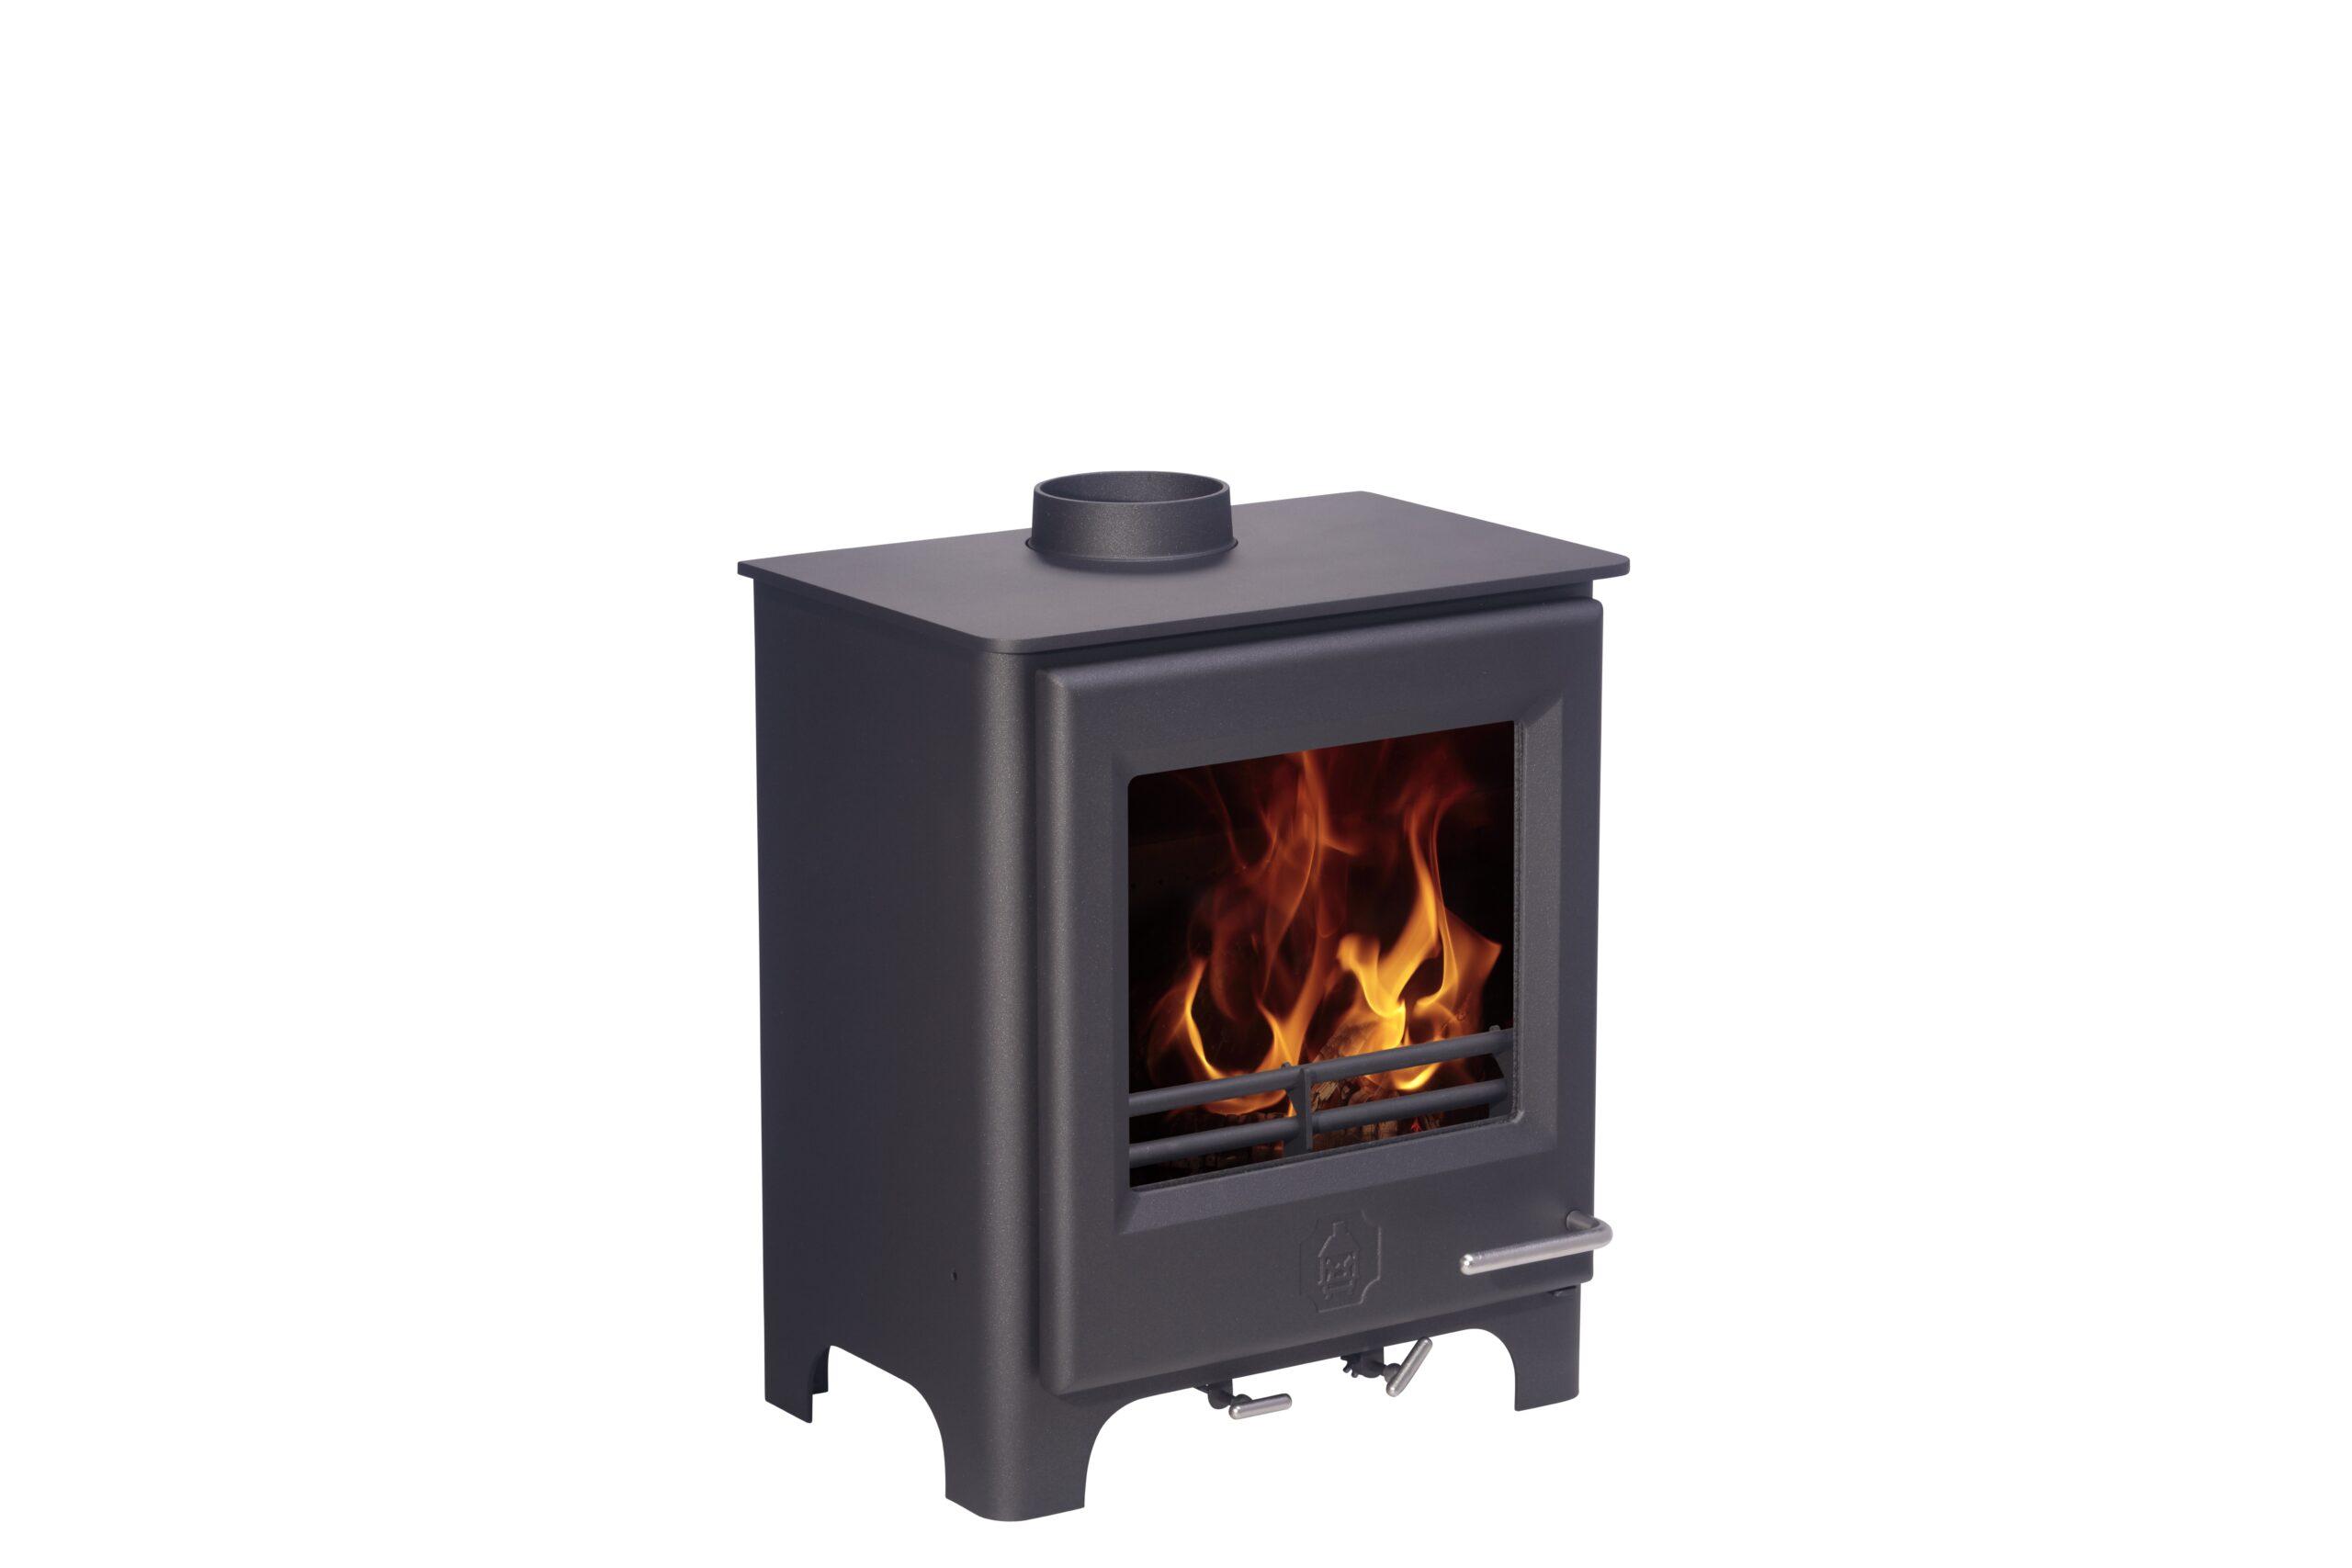 Phoenix Fireblaze Eco Mineral Fuel